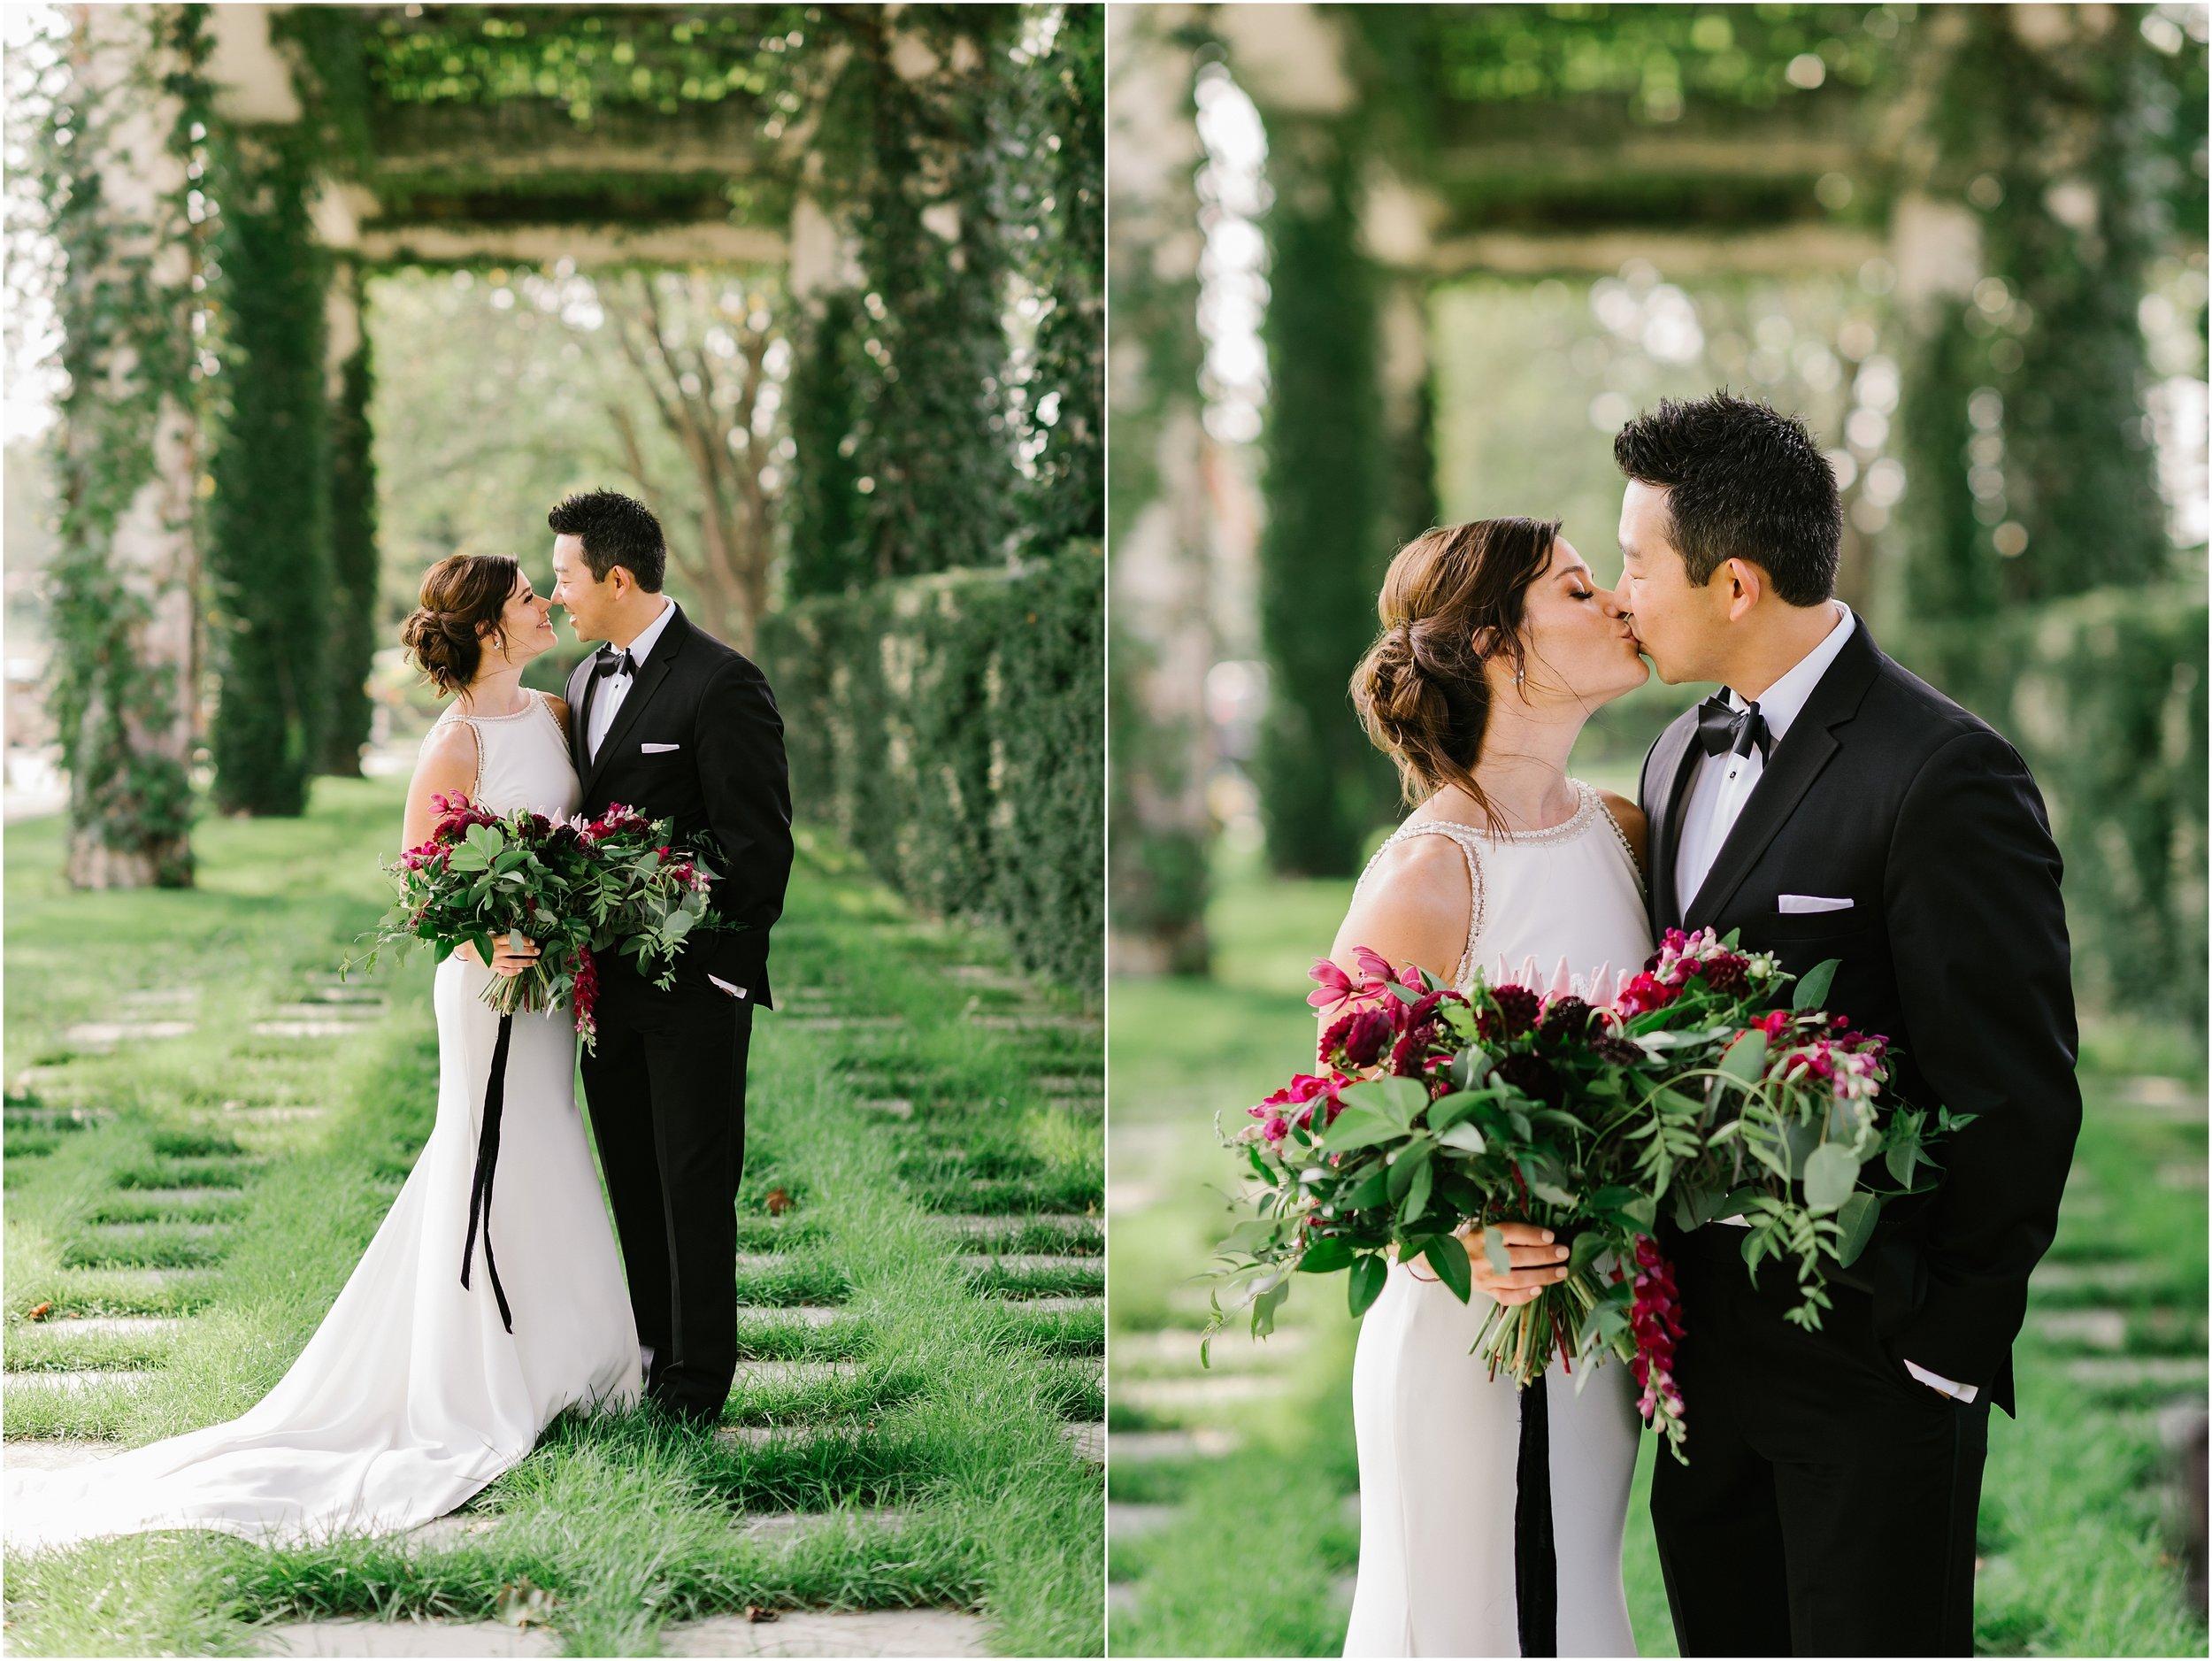 Rebecca_Shehorn_Photography_Indianapolis Wedding Photographer Sycamore at Mallow Run Wedding_9743.jpg